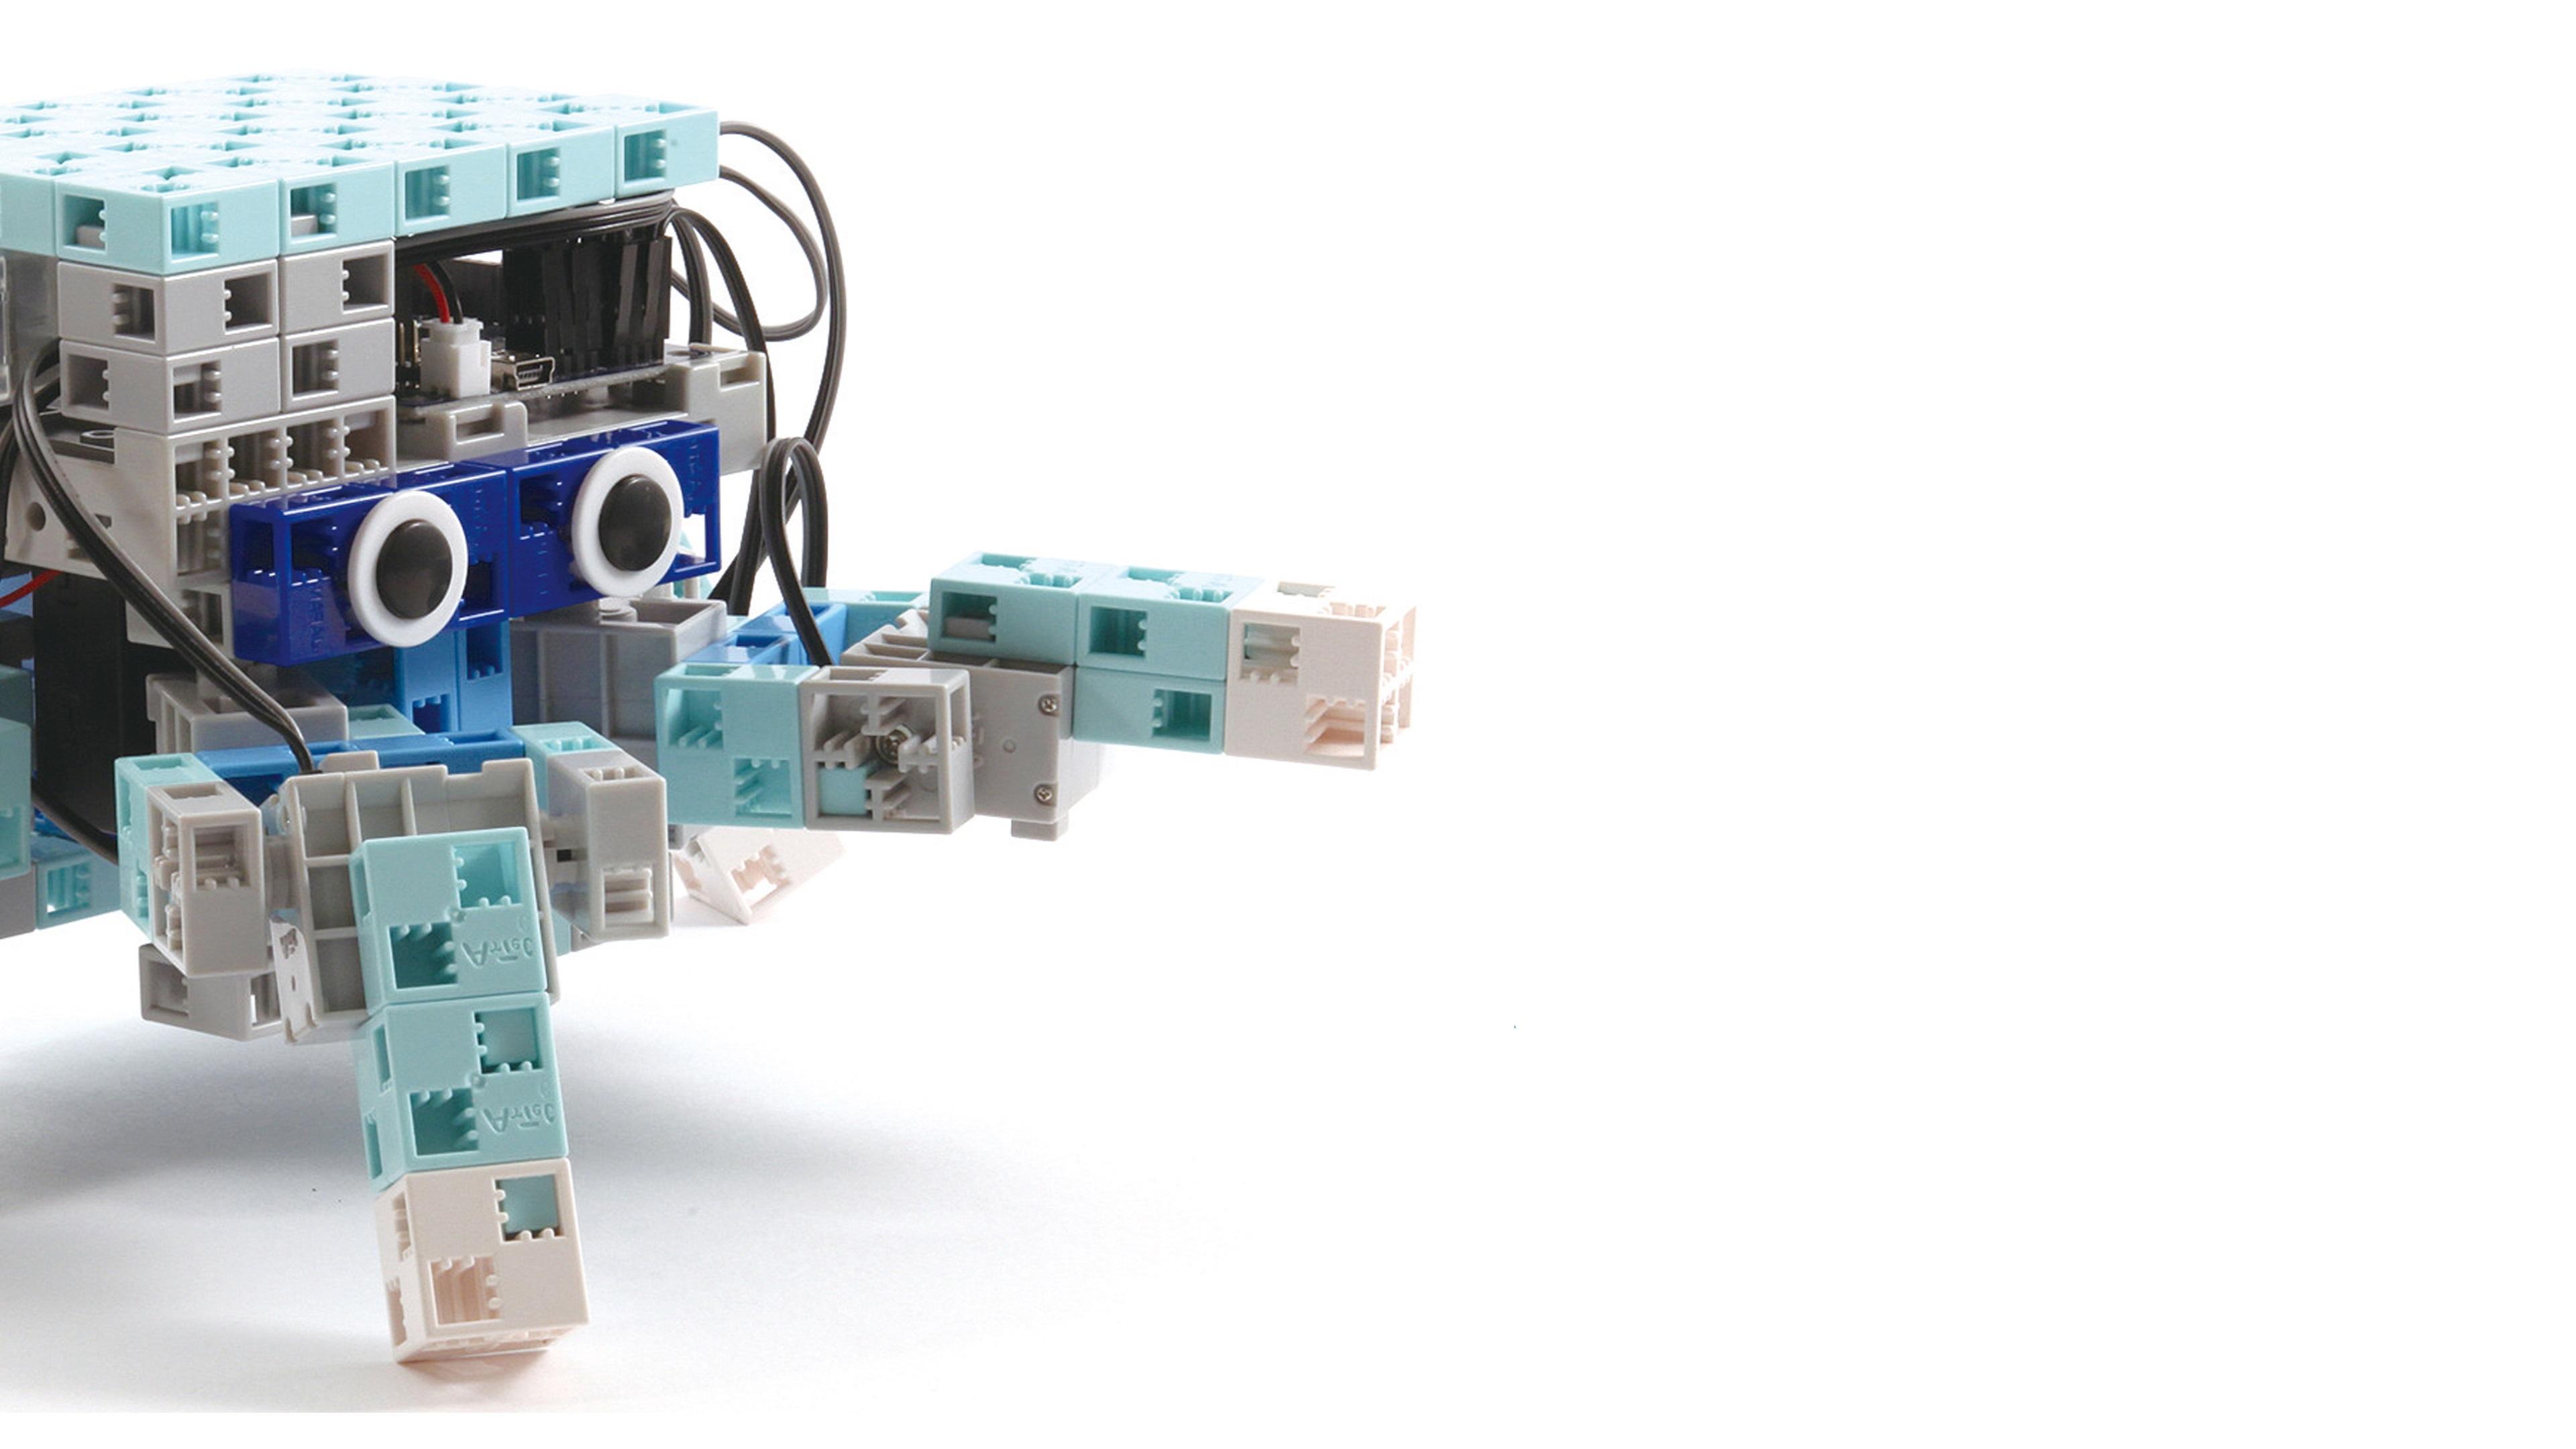 wall-robots02-sans-logo-inv